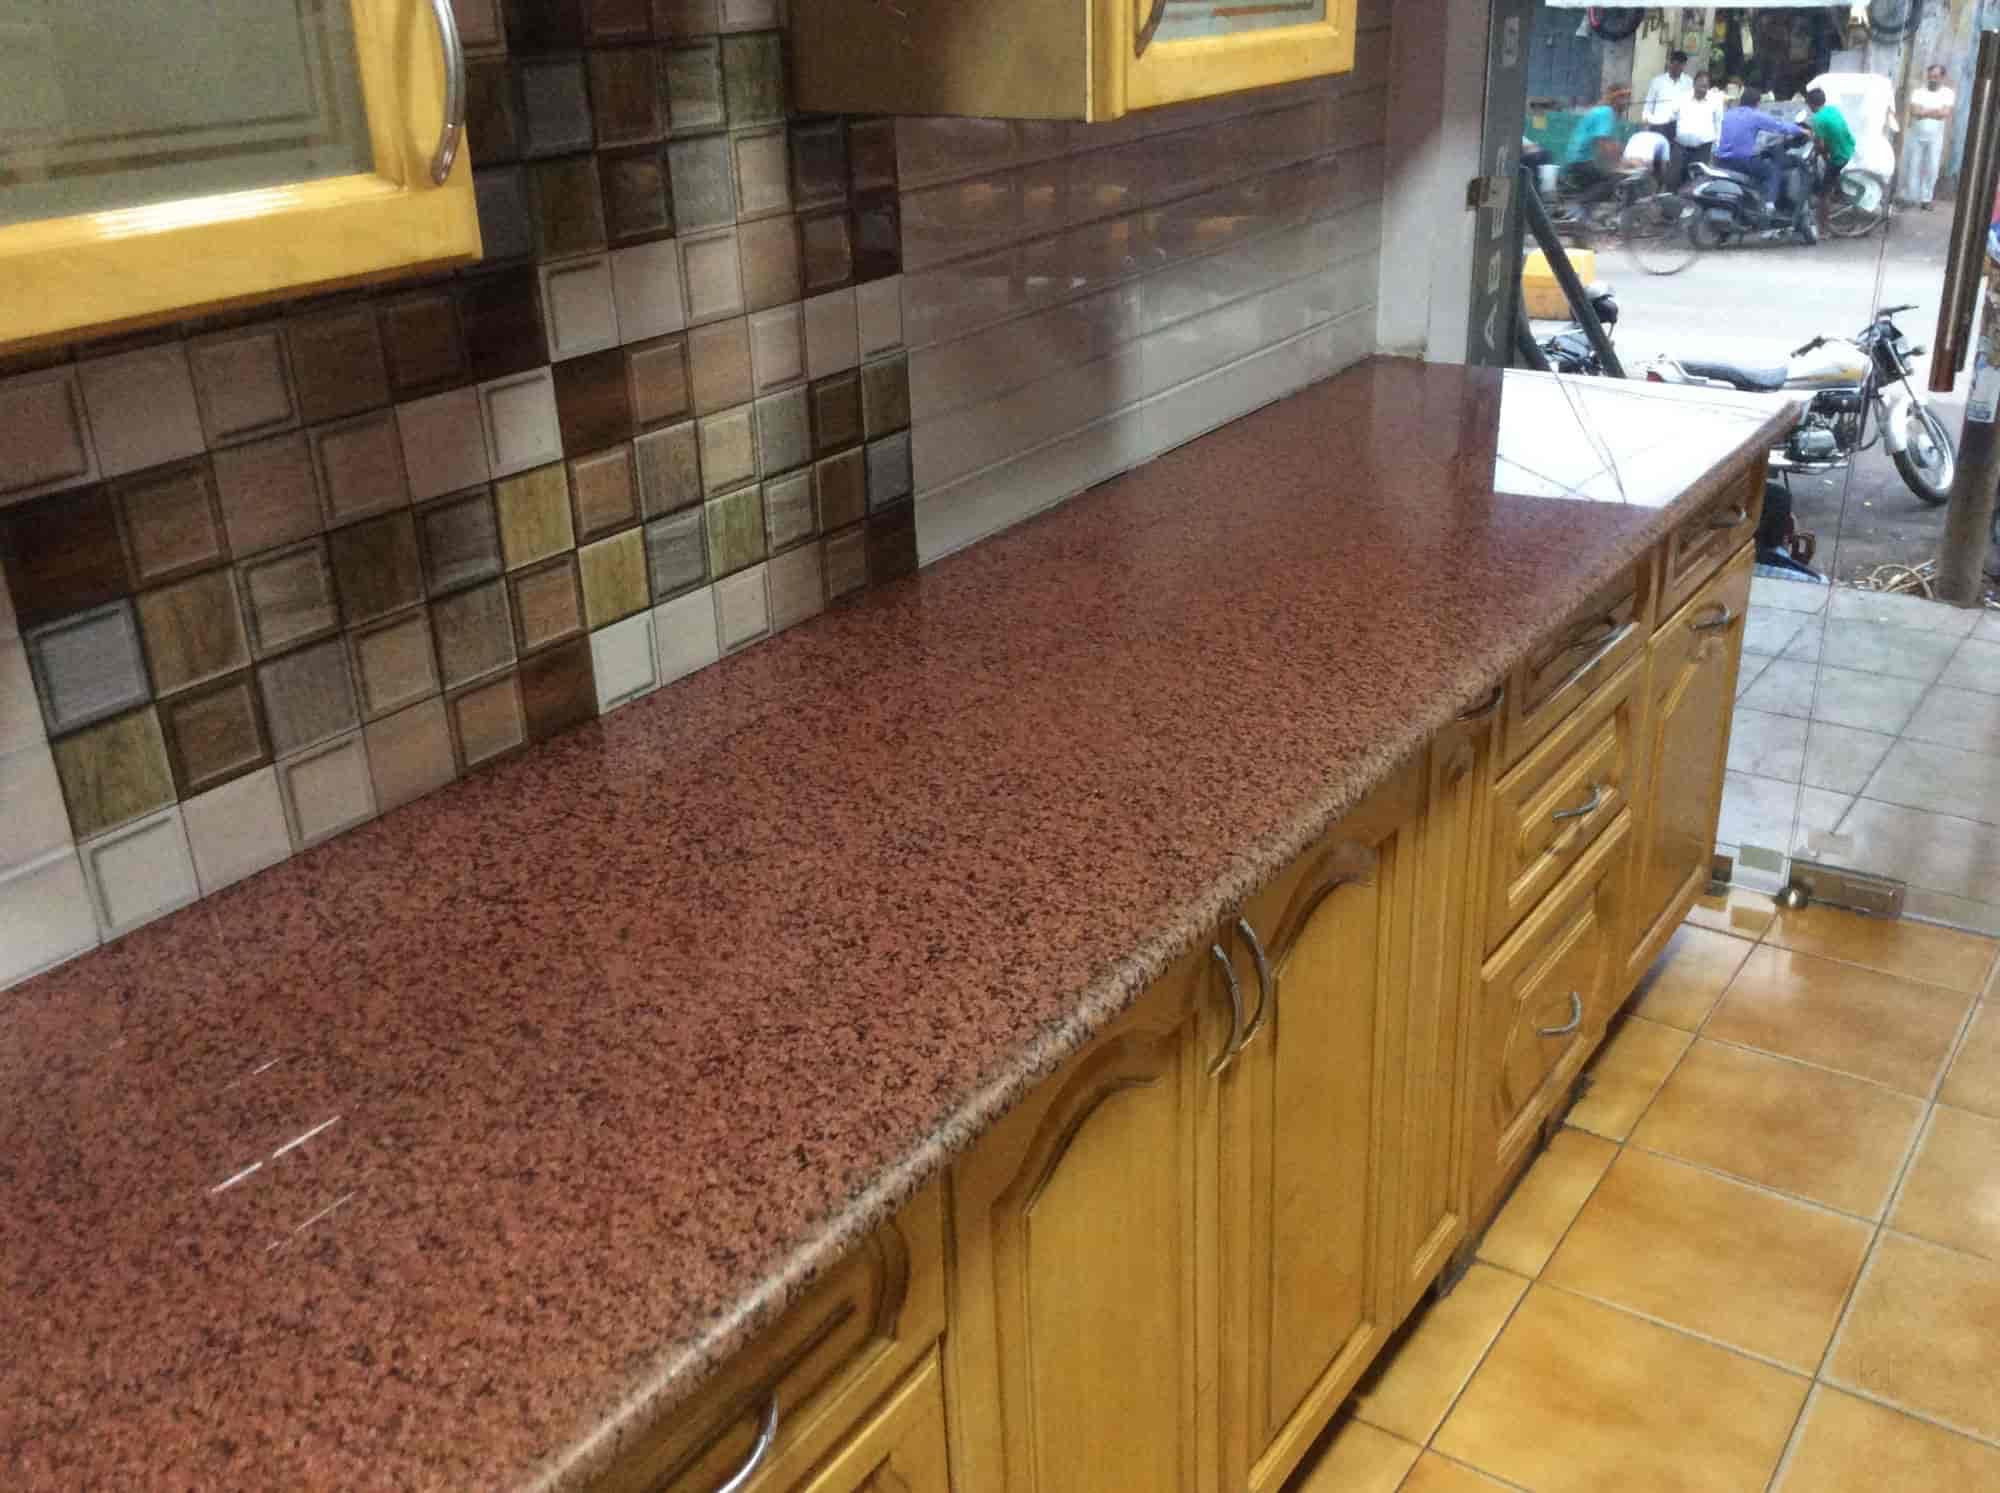 modular porch adp of kitchen image granite and countertops orlando outdoor surfaces for bistrodre design